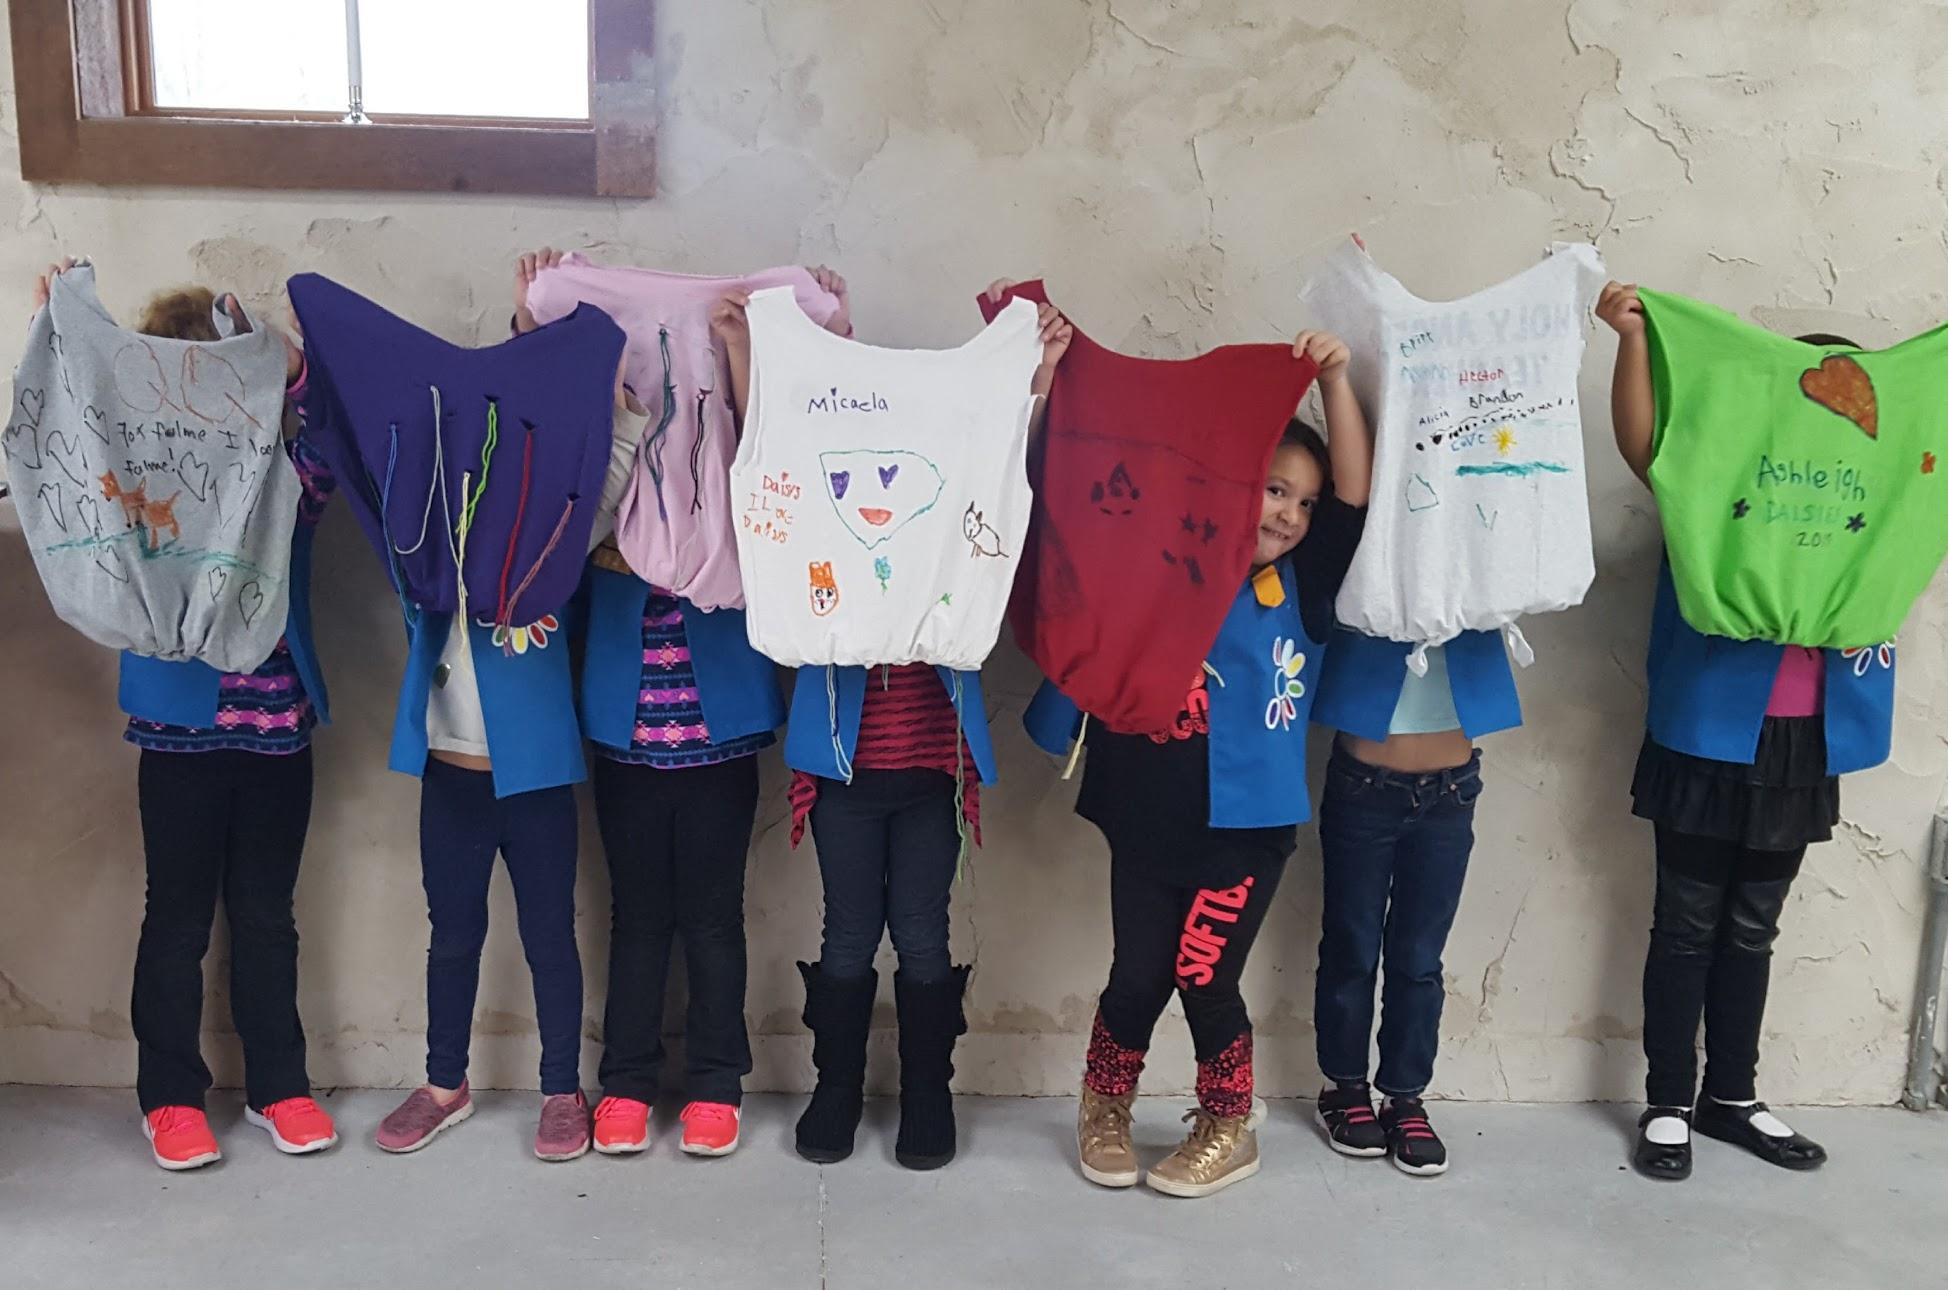 girlscouttroop-bags.jpg